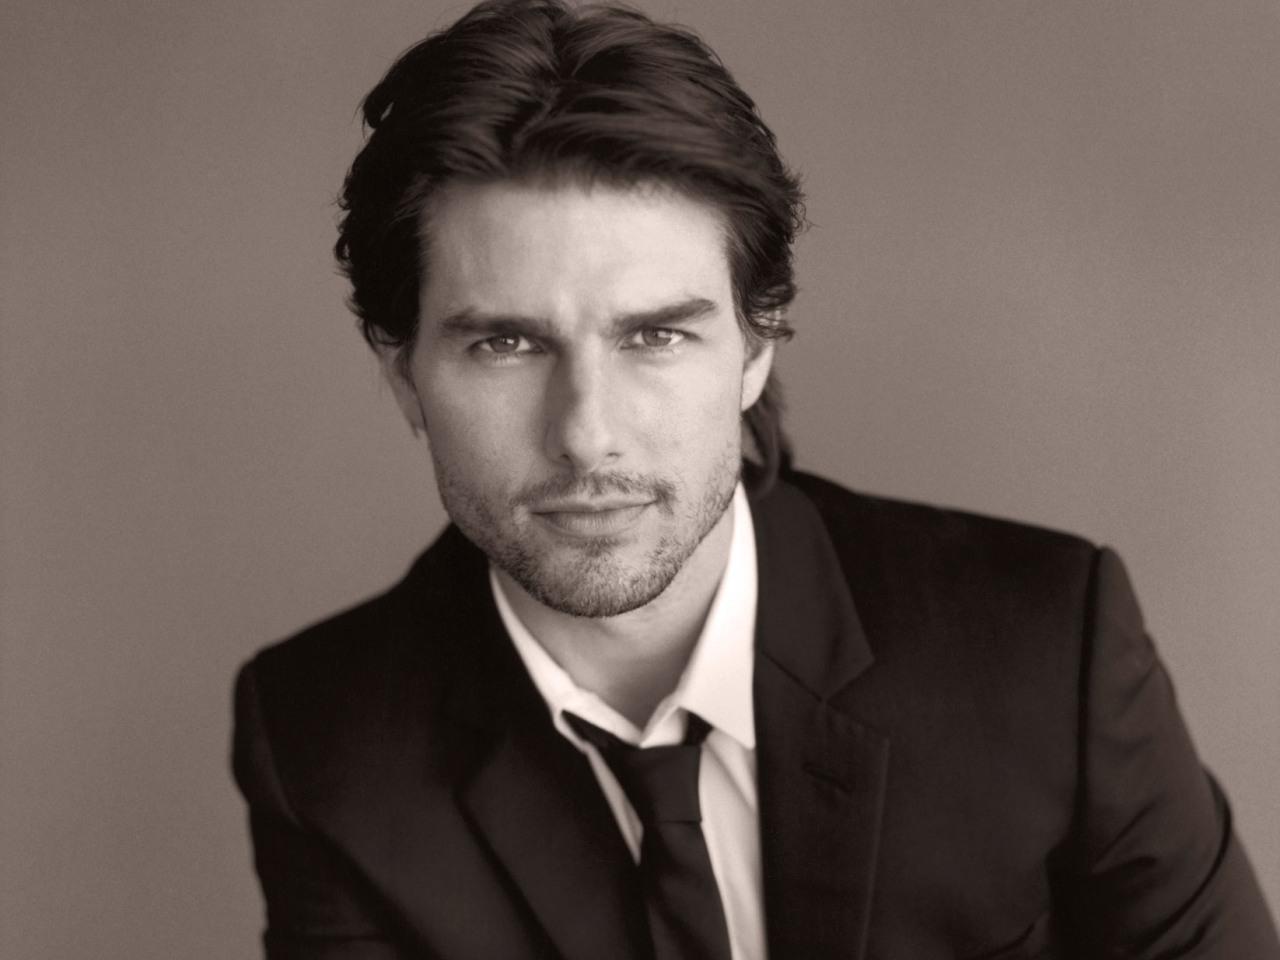 Tom Cruise Hd Wallpaper 6880888 1280x960